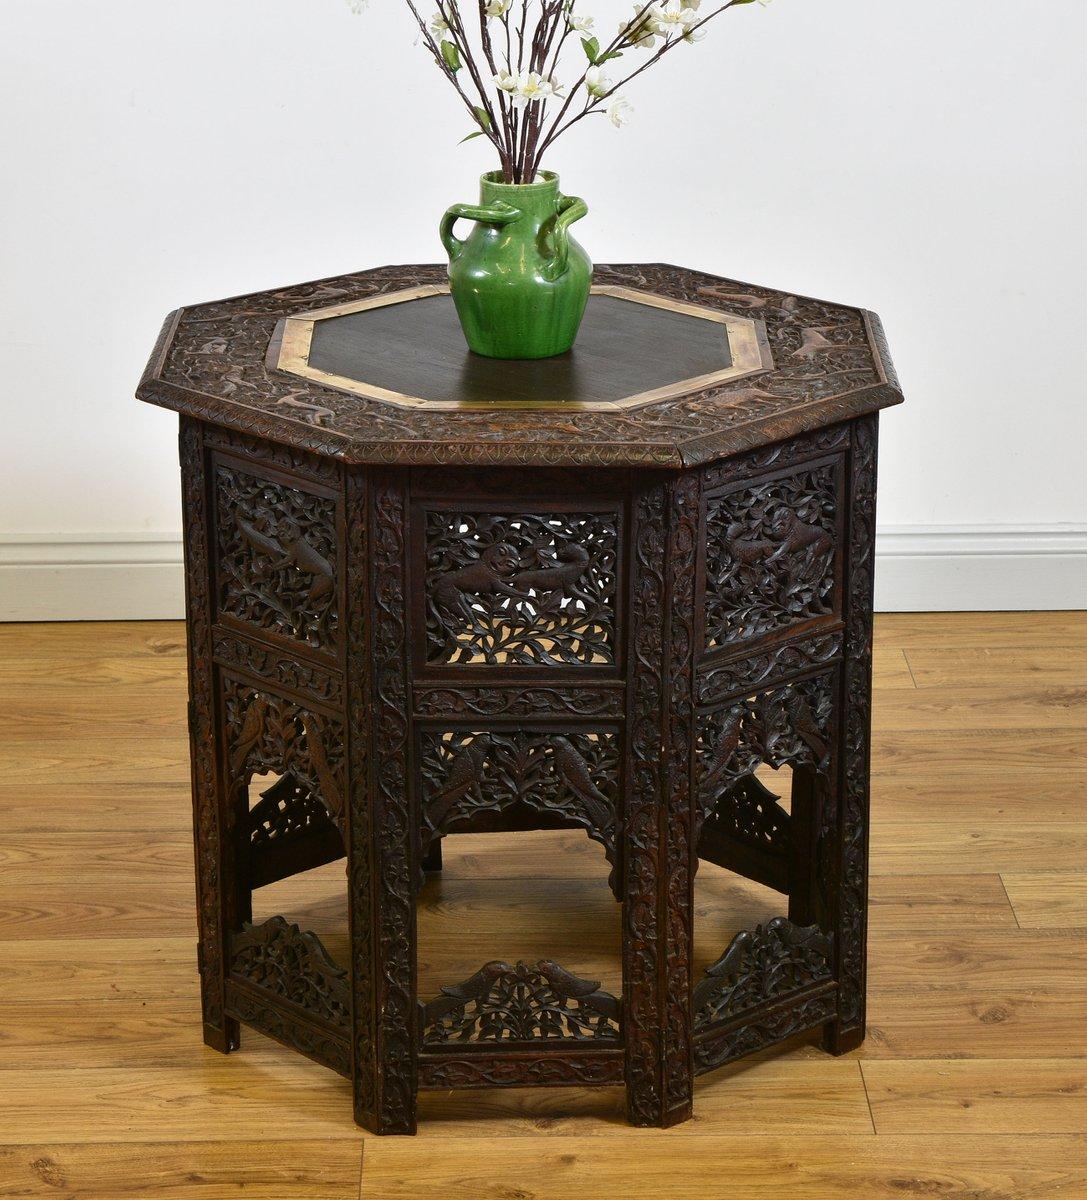 grande table d 39 appoint octogonale pliante anglo indienne. Black Bedroom Furniture Sets. Home Design Ideas